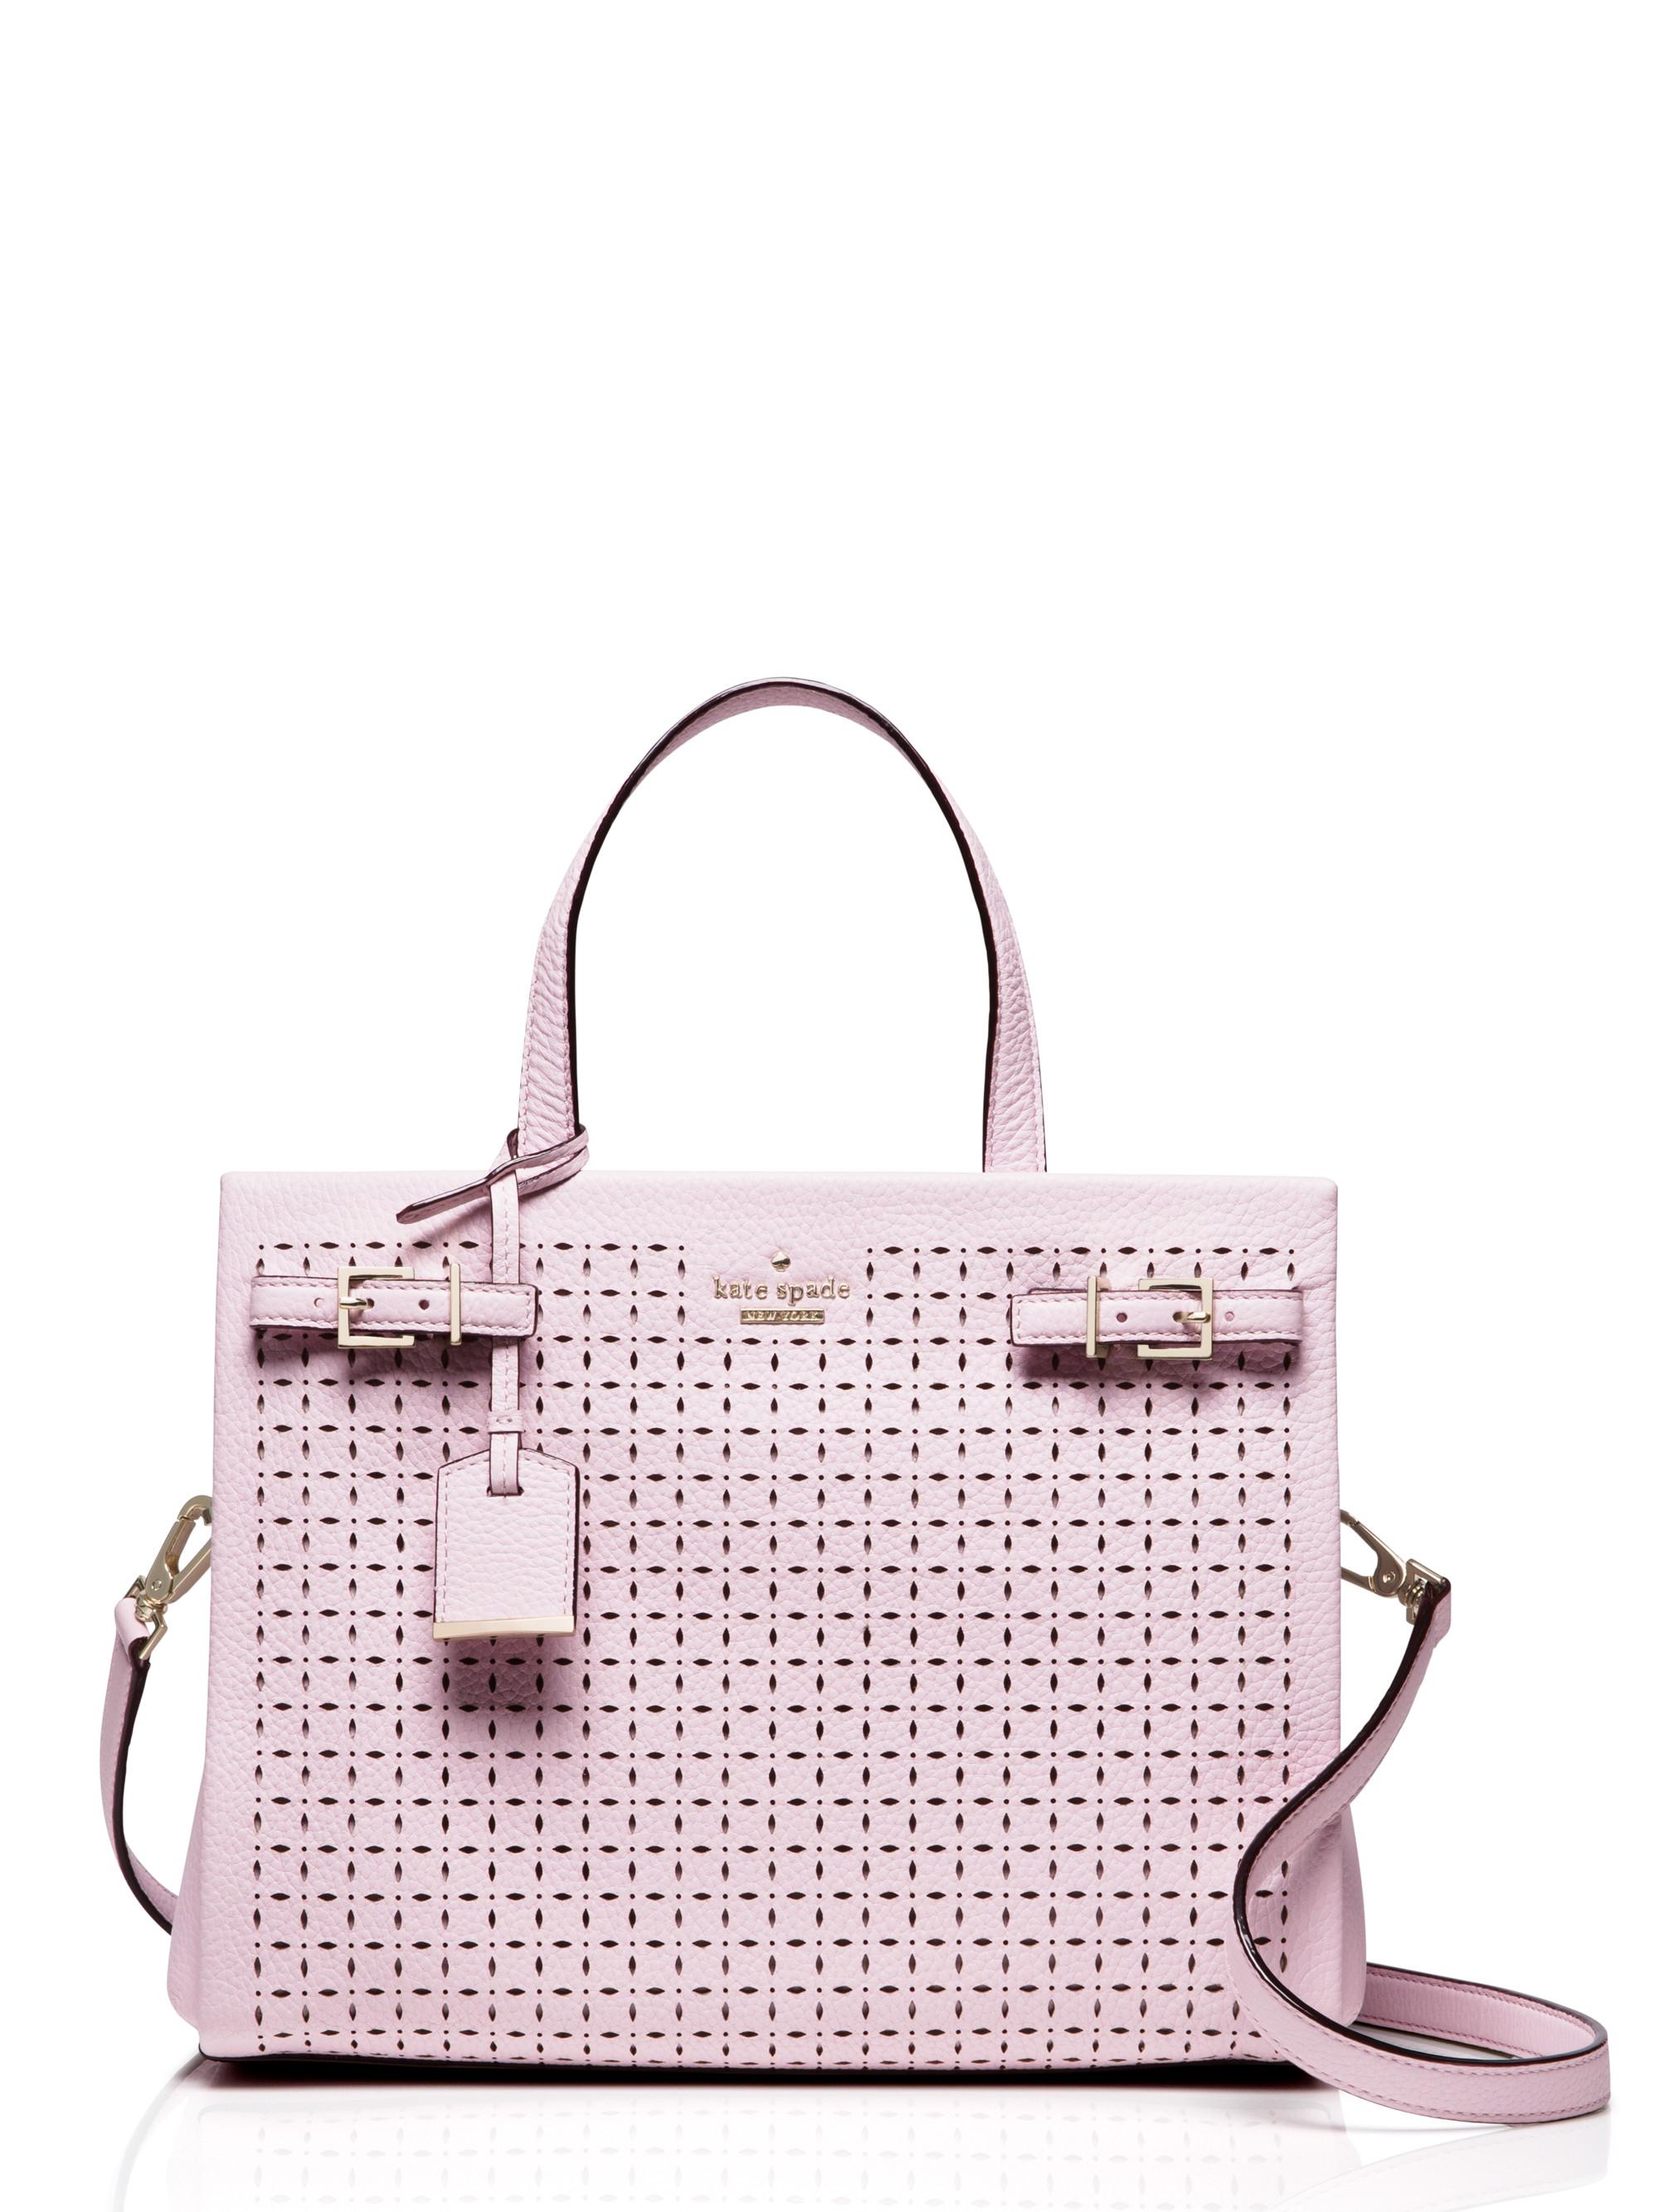 a0cb40f6d75 Kate Spade Milton Lane Olivera In Pink Lyst. Cedar Street Maise Satchel Bag  Pink Blush